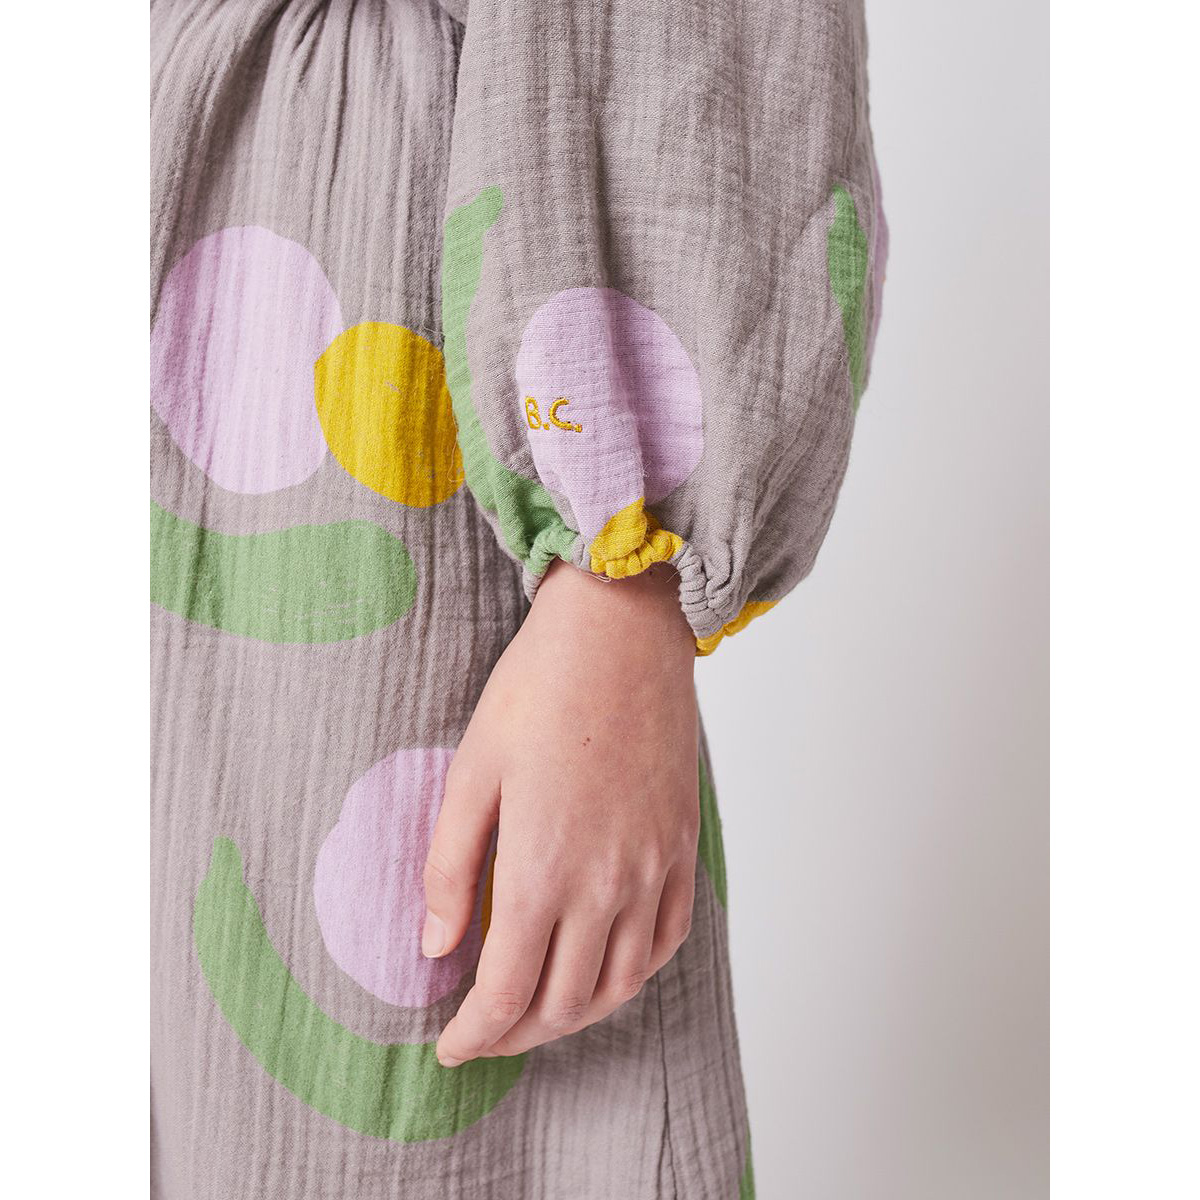 From spain BOBO CHOSES Fruits All Over woven dress 100/110/120/130/140-150 オーガニックコットン100%